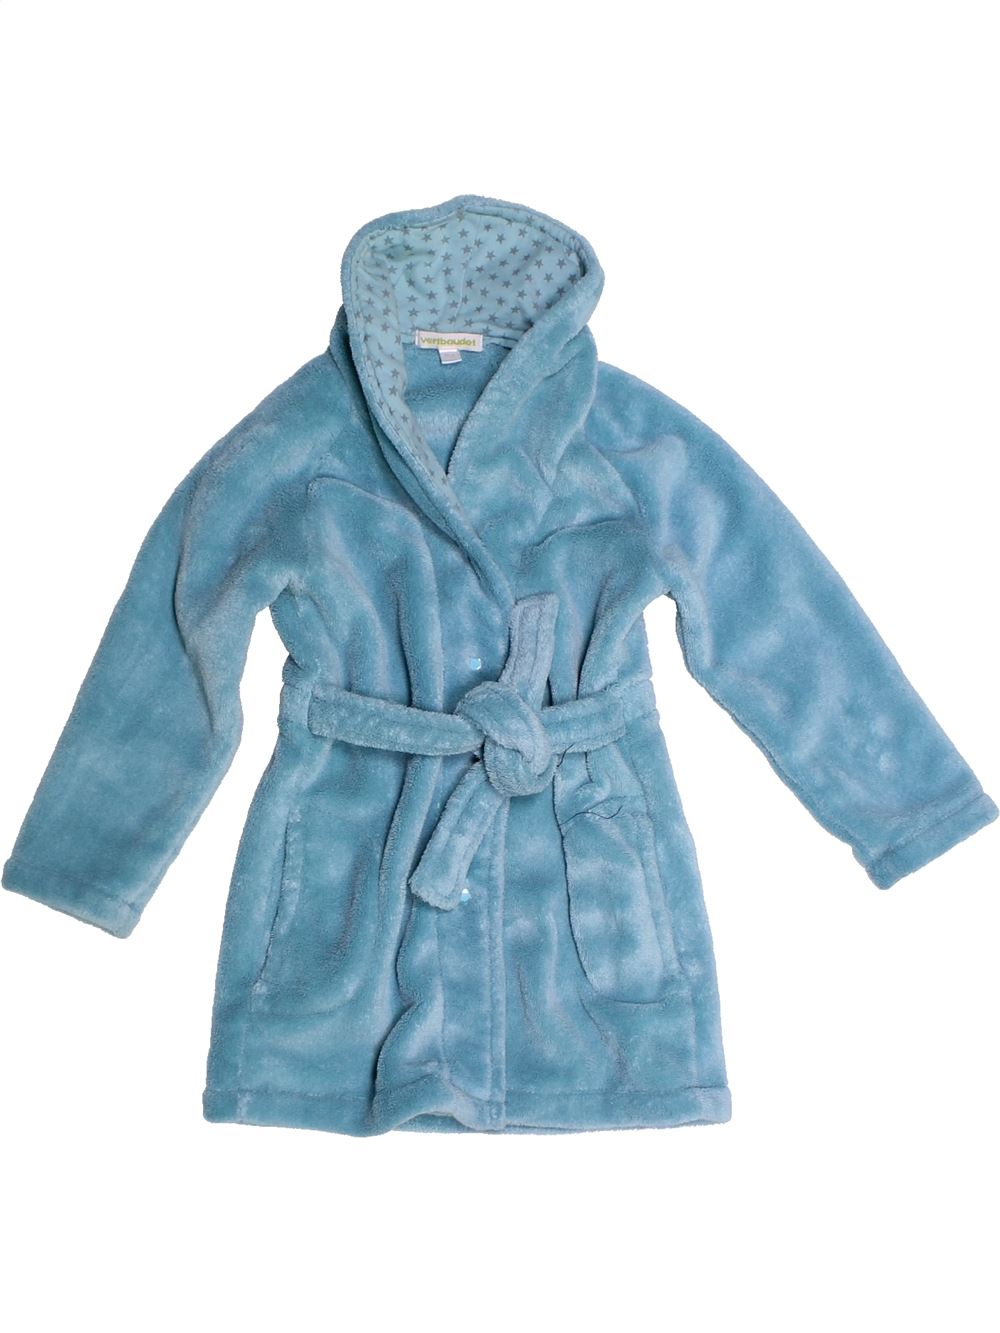 Robe de chambre Garçon VERTBAUDET 3 ans pas cher, 5.00 € - #1260070